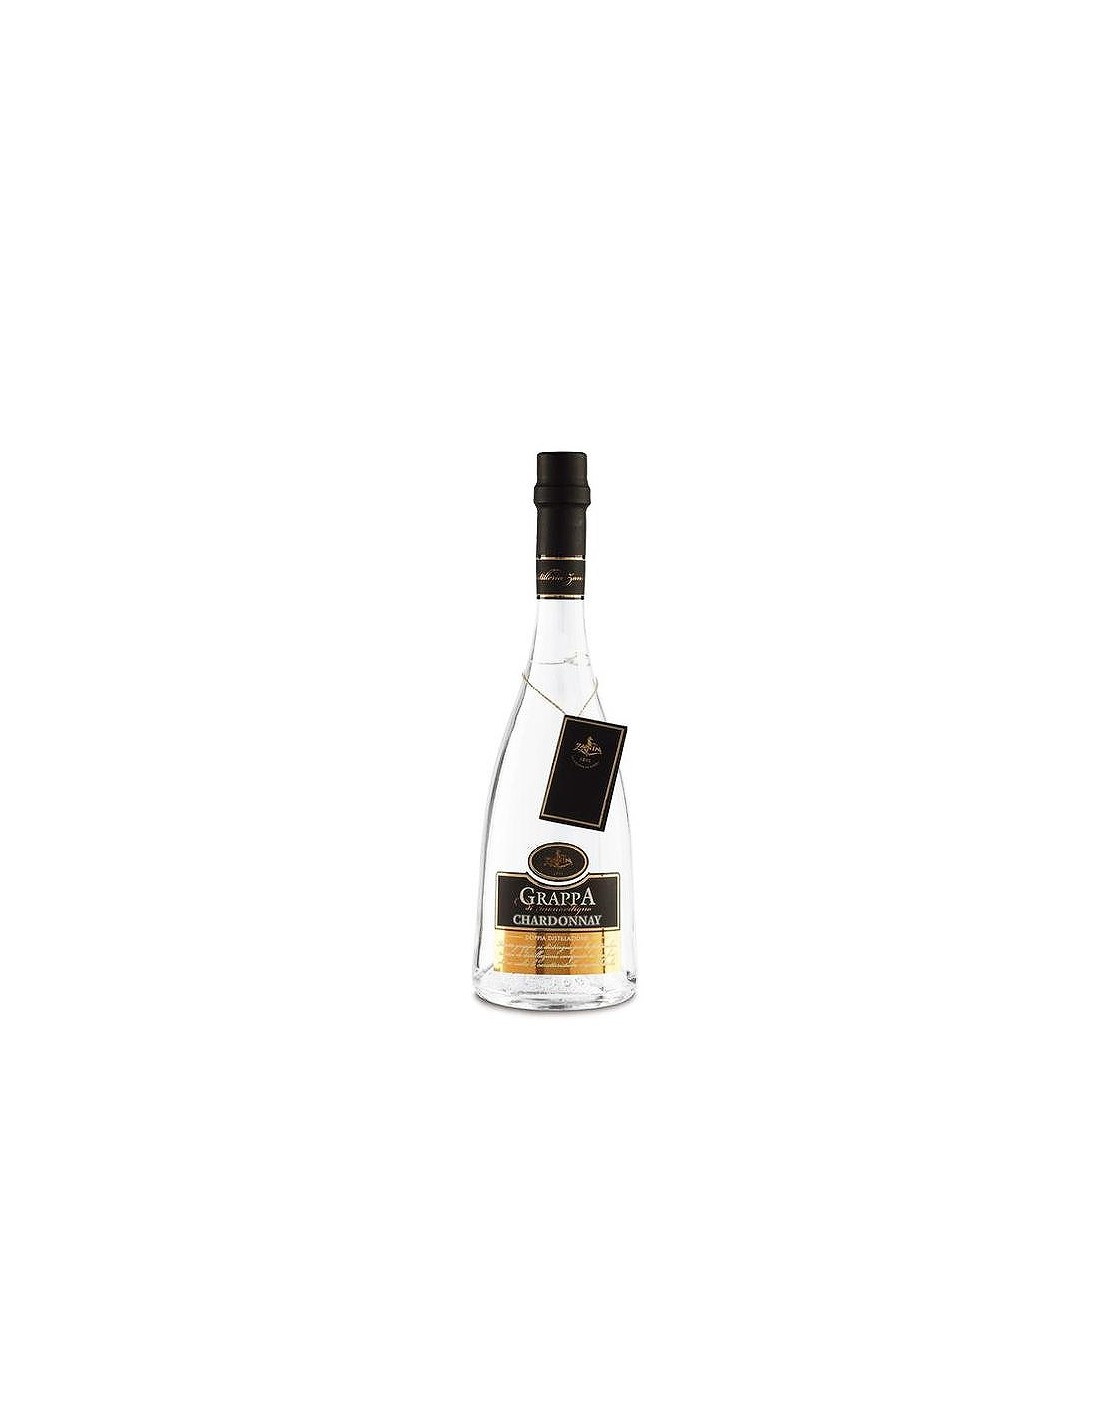 Bautura traditionala Grappa Chardonnay, 40% alc., 0.7L, Italia